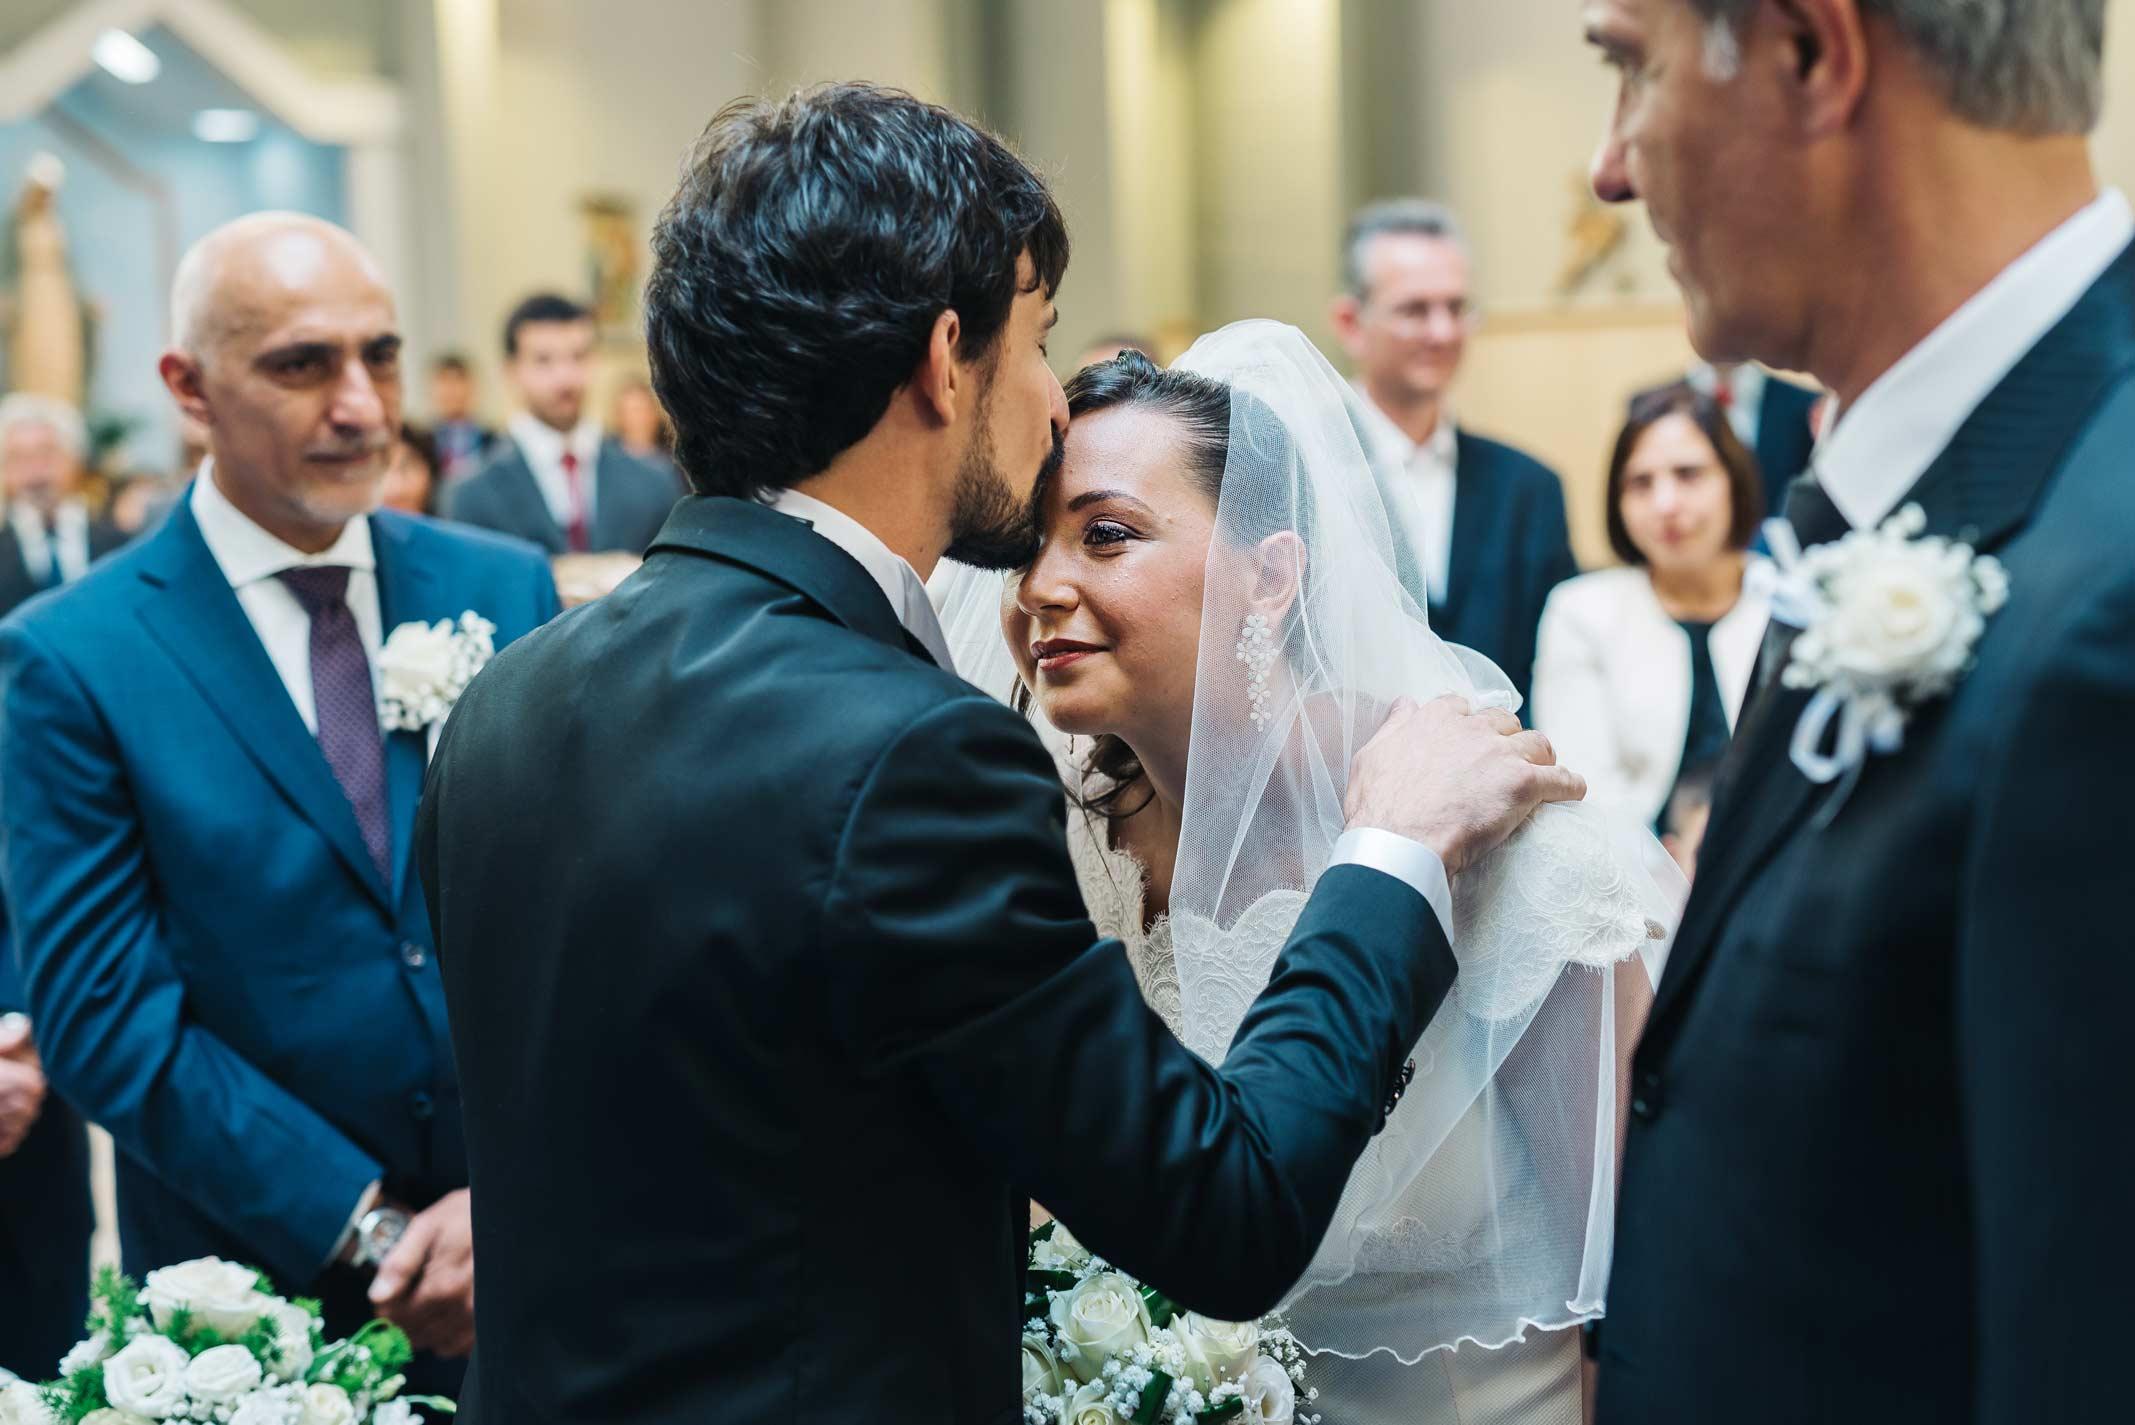 Reportage-Wedding-Photography-Ceremony